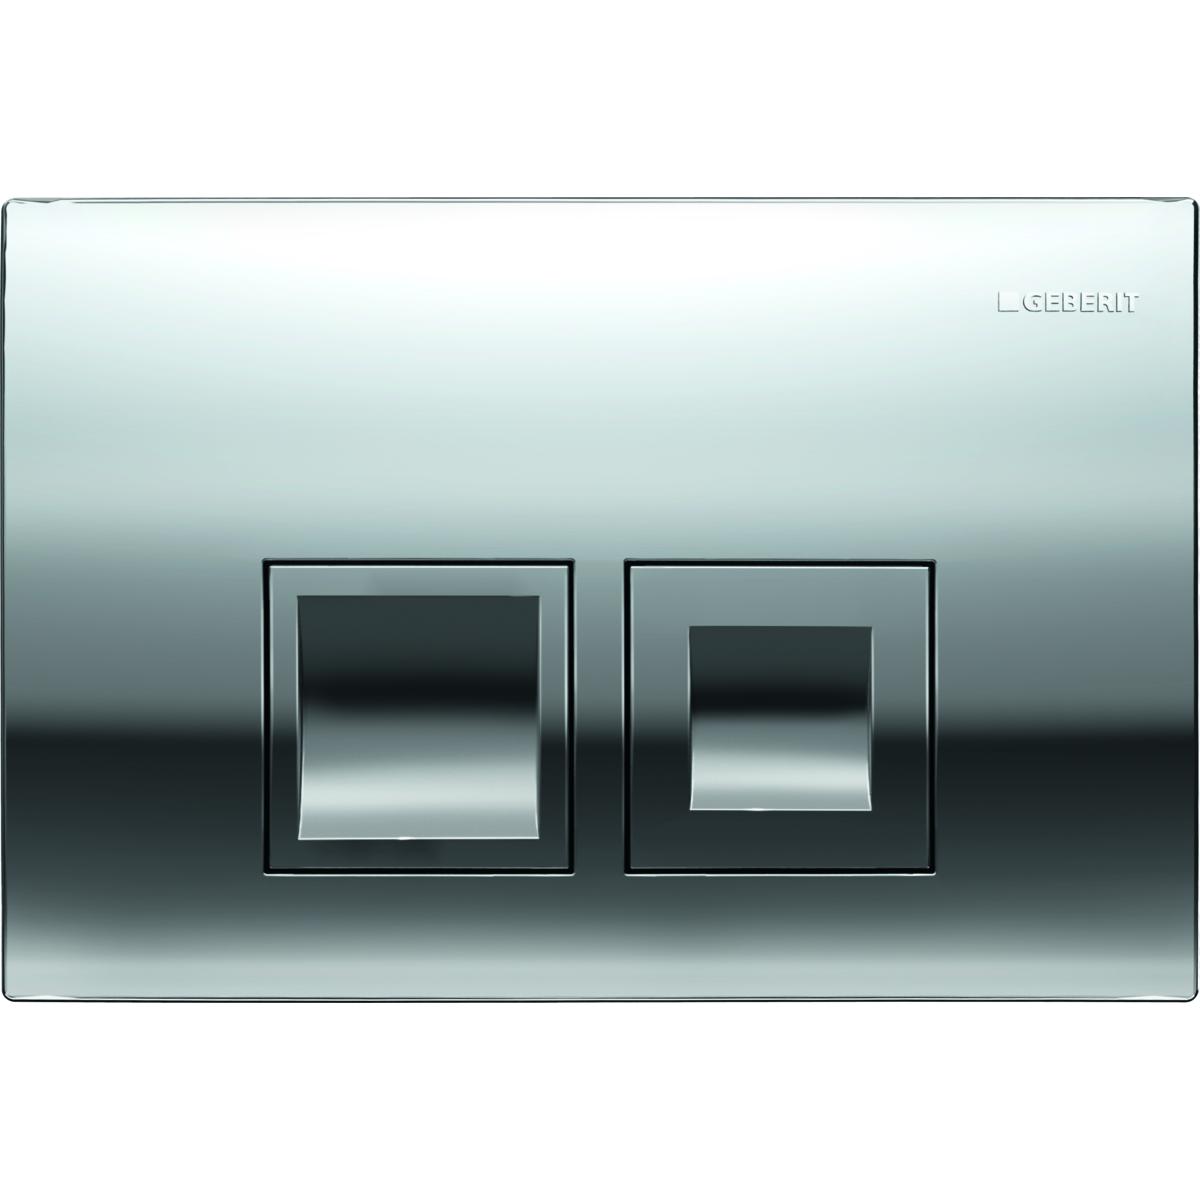 Кнопка смыва GEBERIT 115.135.21.1 Delta 50 пластик (хром)